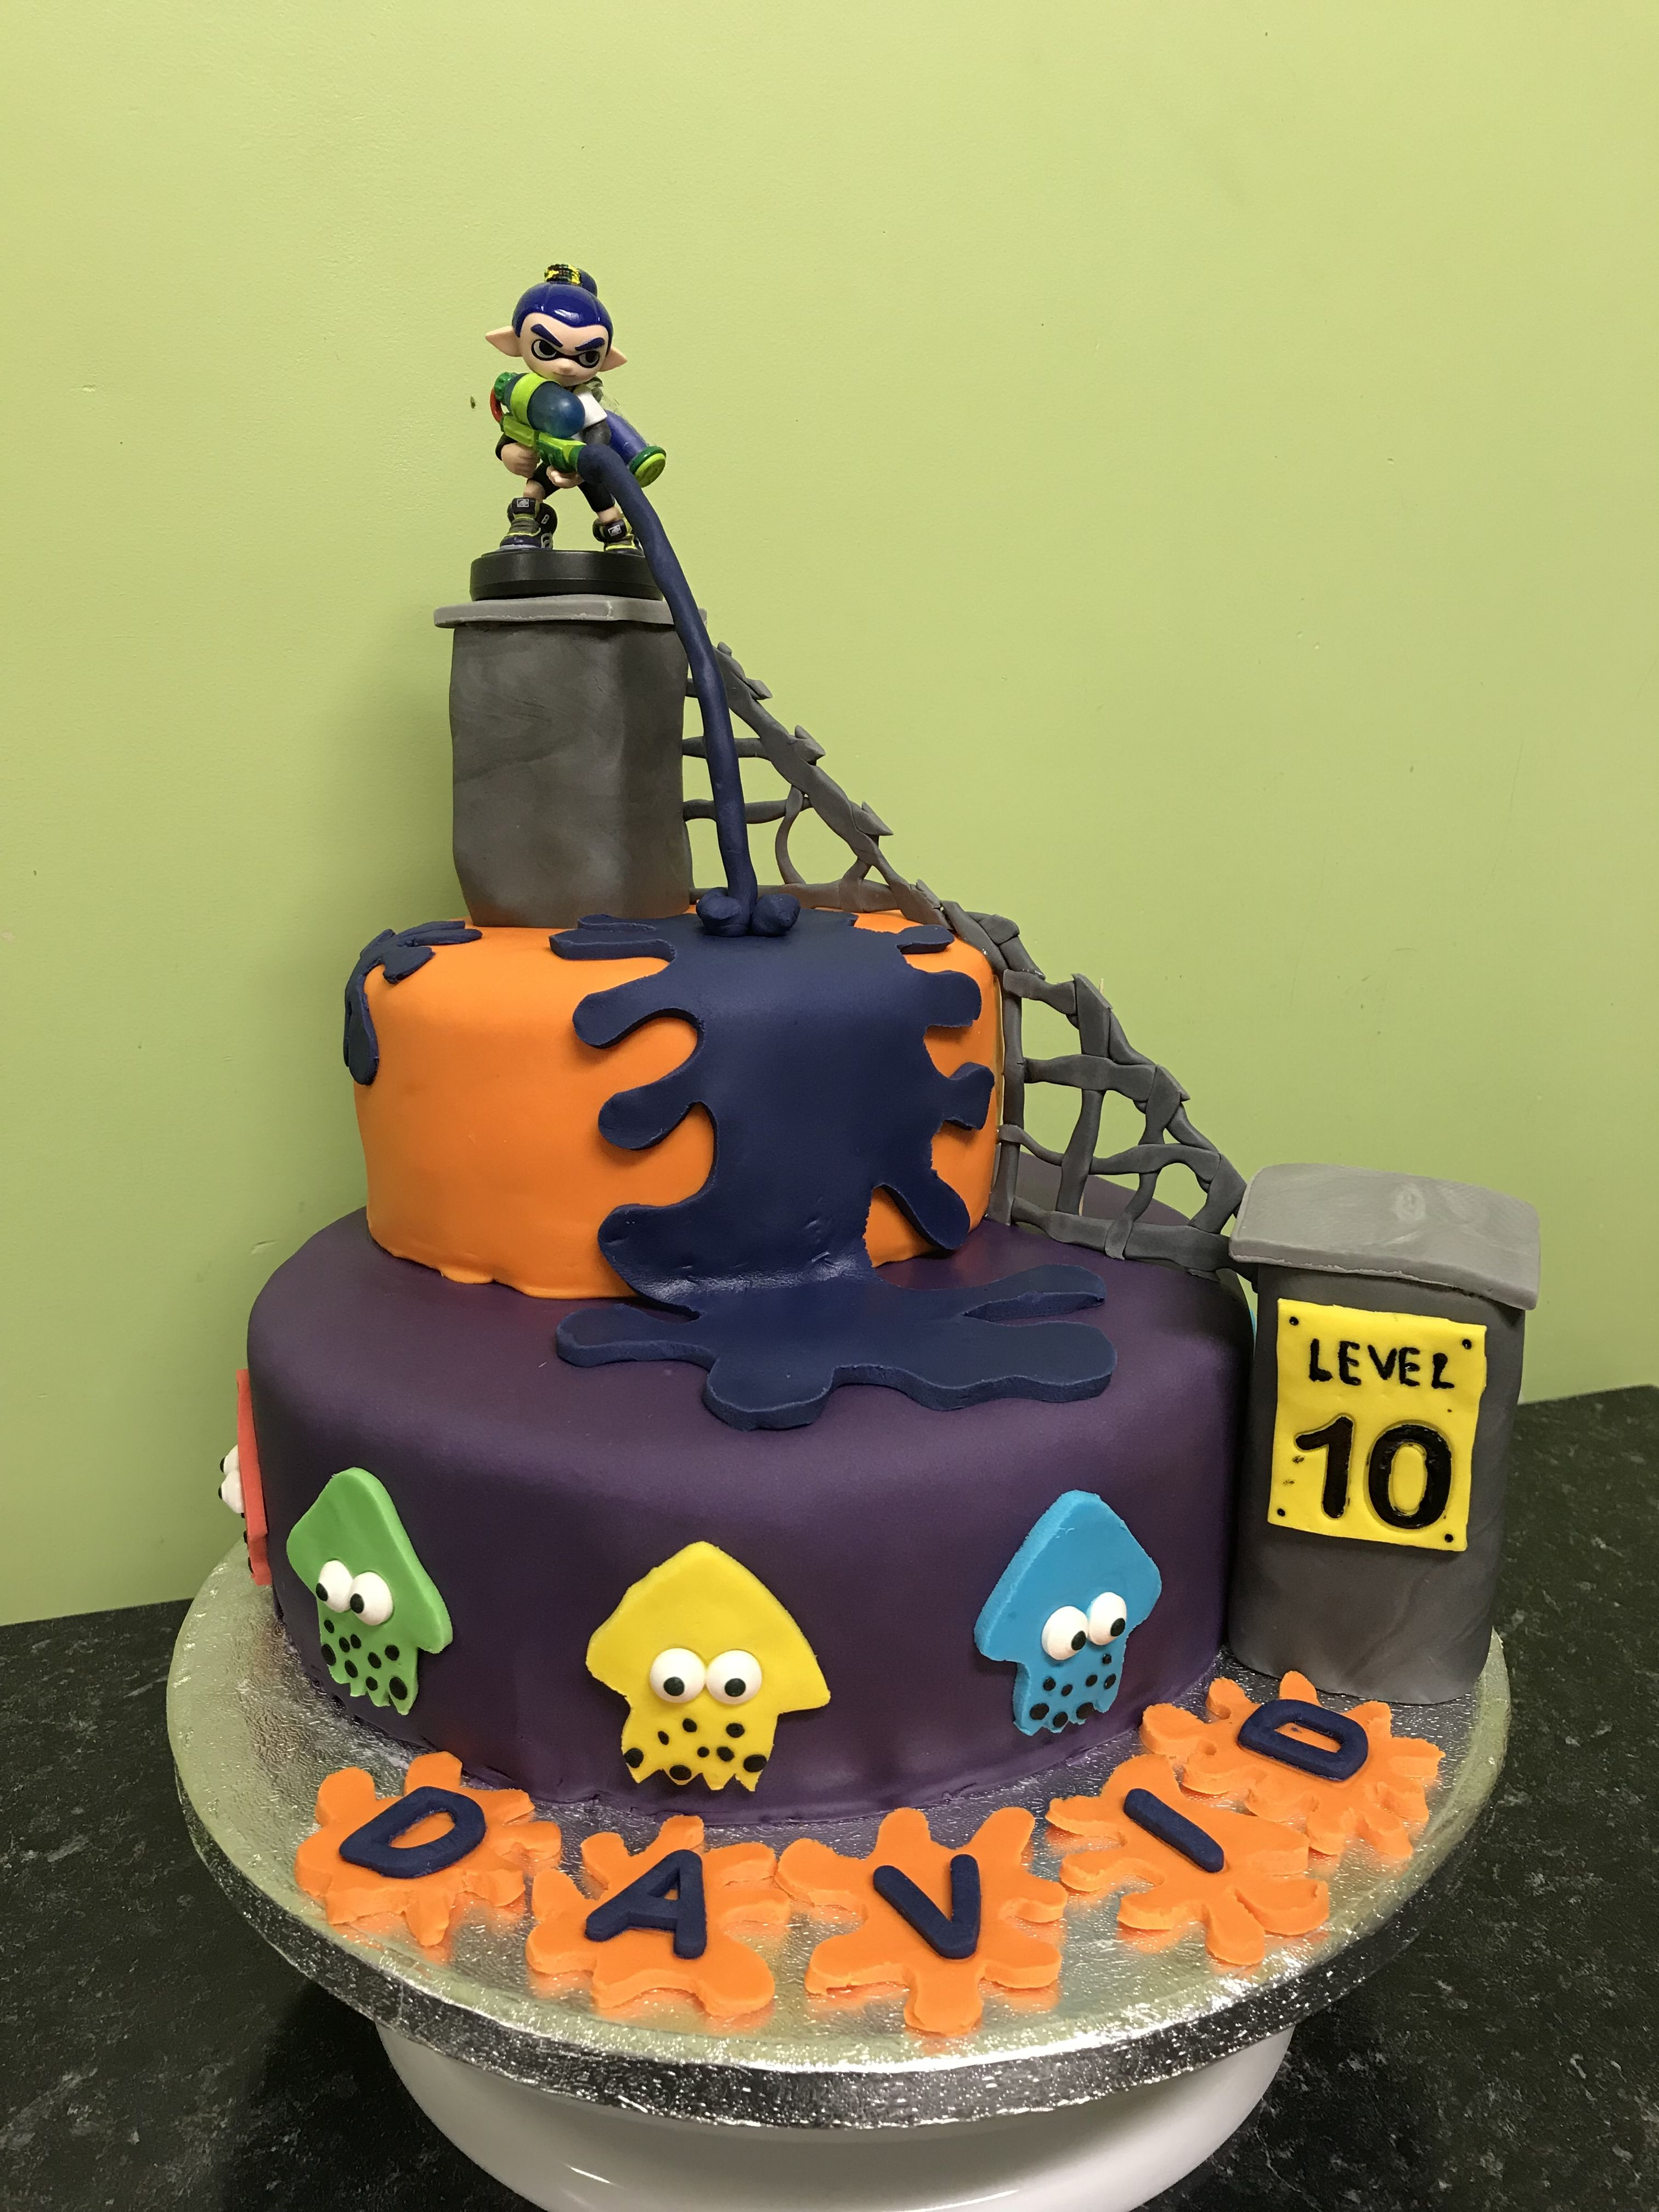 Splatoon cake | Desserts, Cake, Food